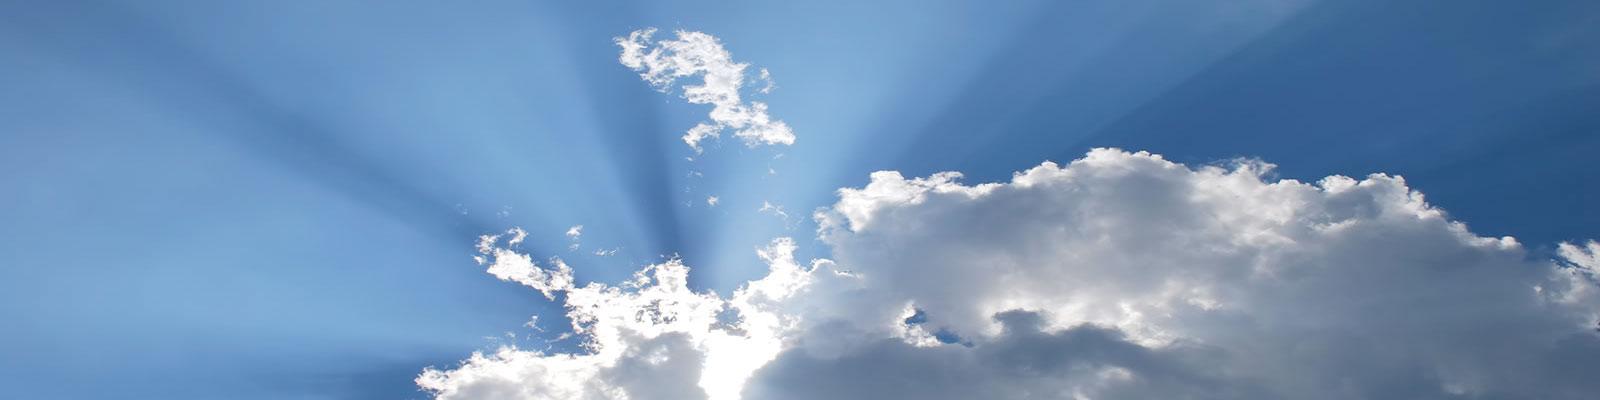 Nuvola